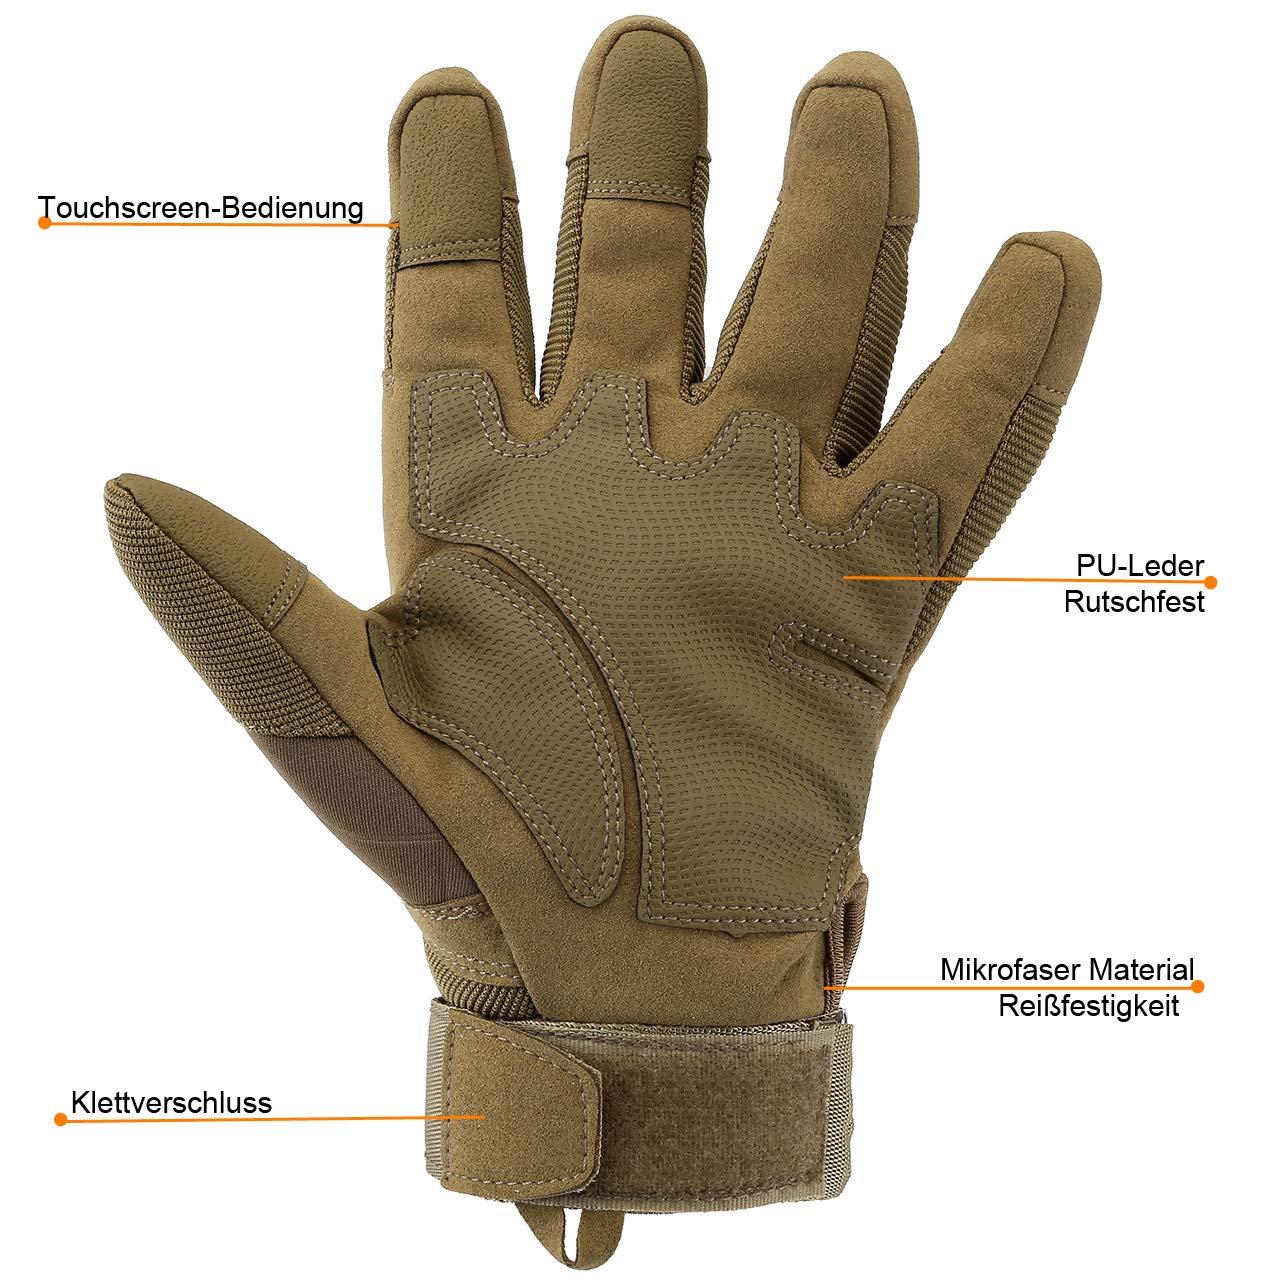 Sandfarbe, M ACBungji Voller Finger Handschuhe Motorradhandschuhe f/ür MTB Mountainbike Motorrad Motocross Quad Paintball Airsoft Security Tactical Milit/är KTM Fahrrad Rad Herren Damen Touchscreen